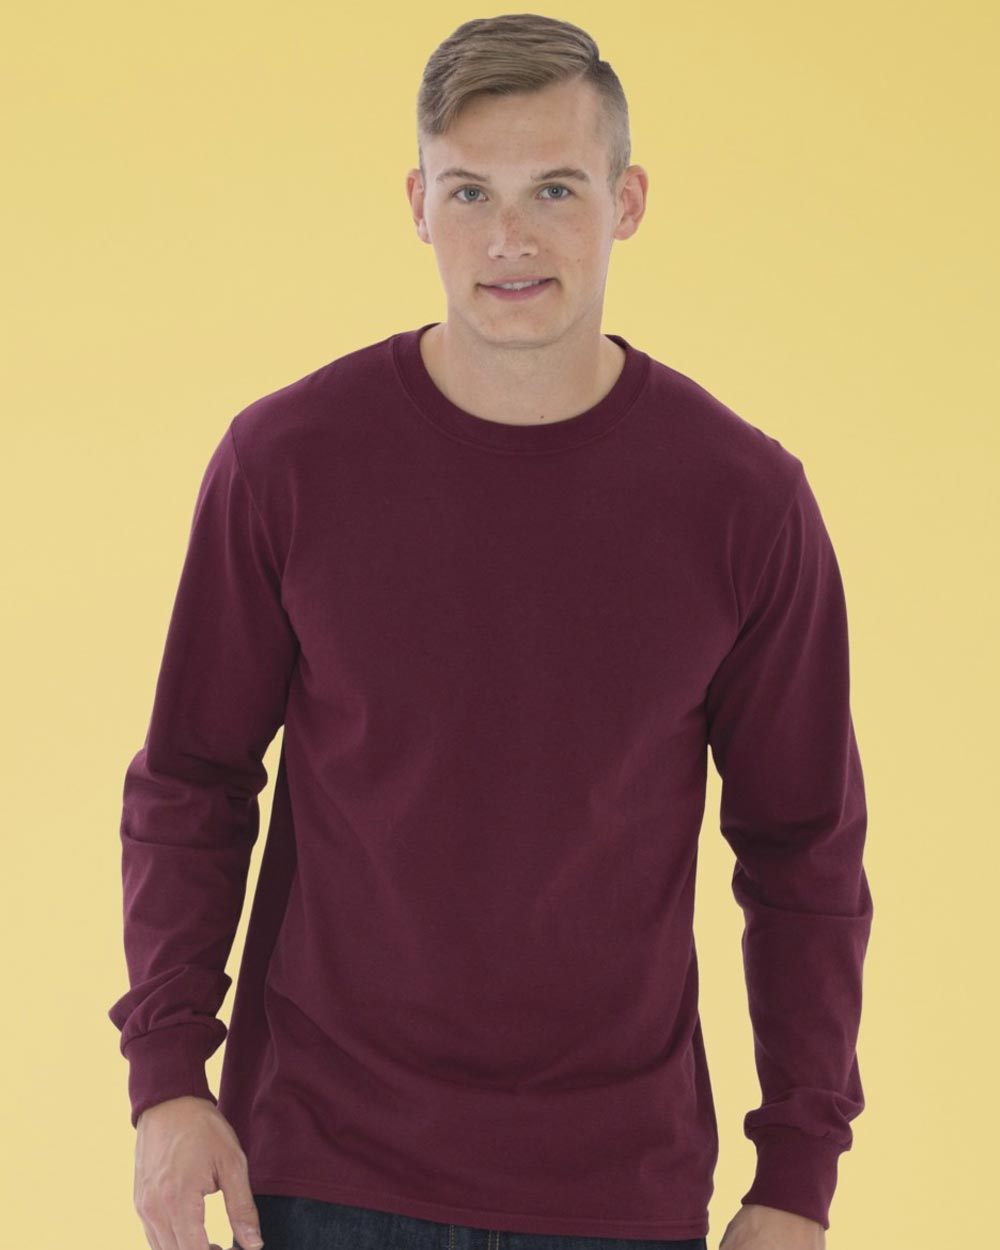 ATC 1015 - Everyday Cotton Long Sleeve Tee